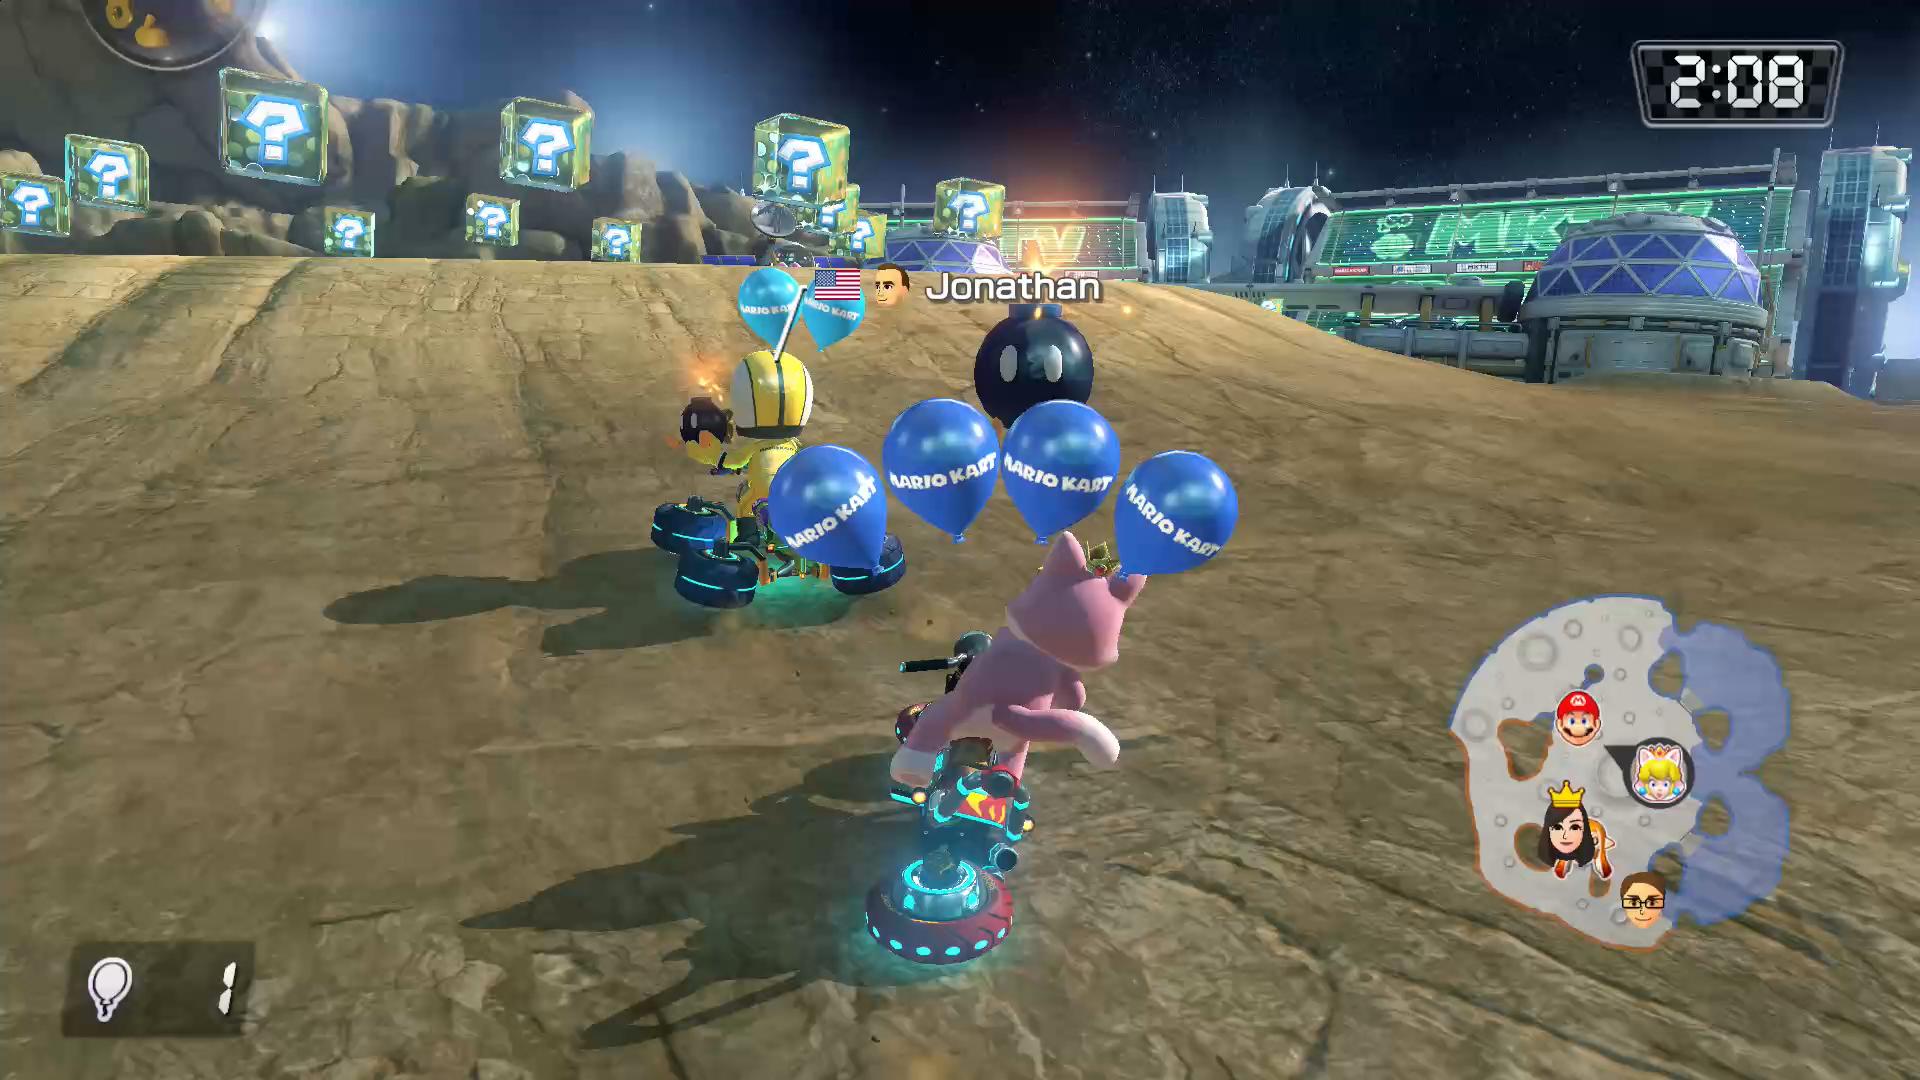 6 Tips For Battle Mode In Mario Kart 8 Deluxe Inverse